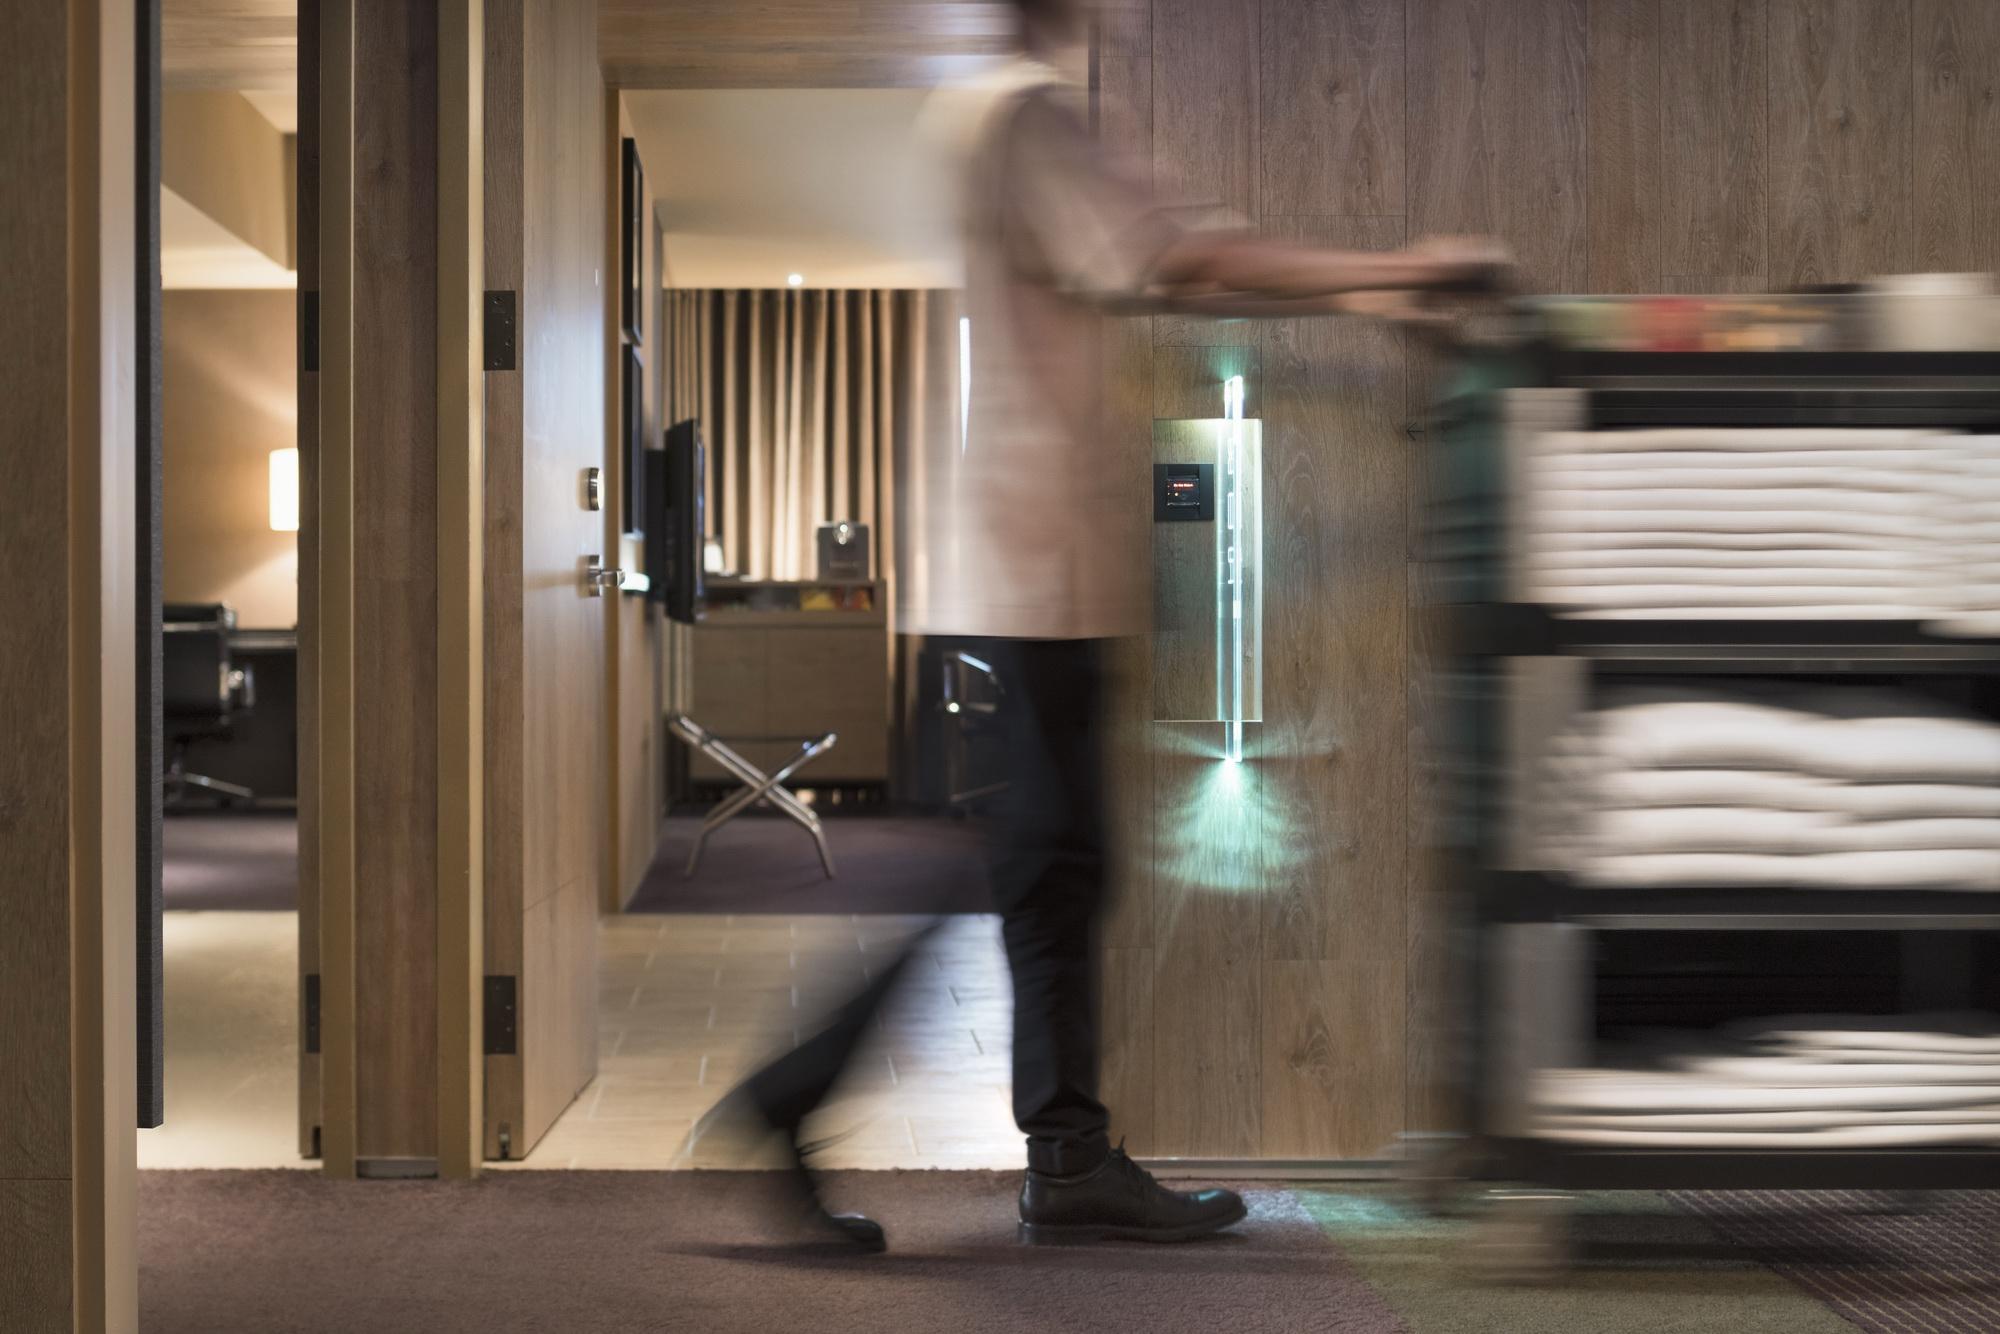 http://highliteimages.com/wp-content/uploads/2019/01/2016-01-26-HOTEL-QUOTE-HighliteImages-_DSC0073-fix-1-T.jpg